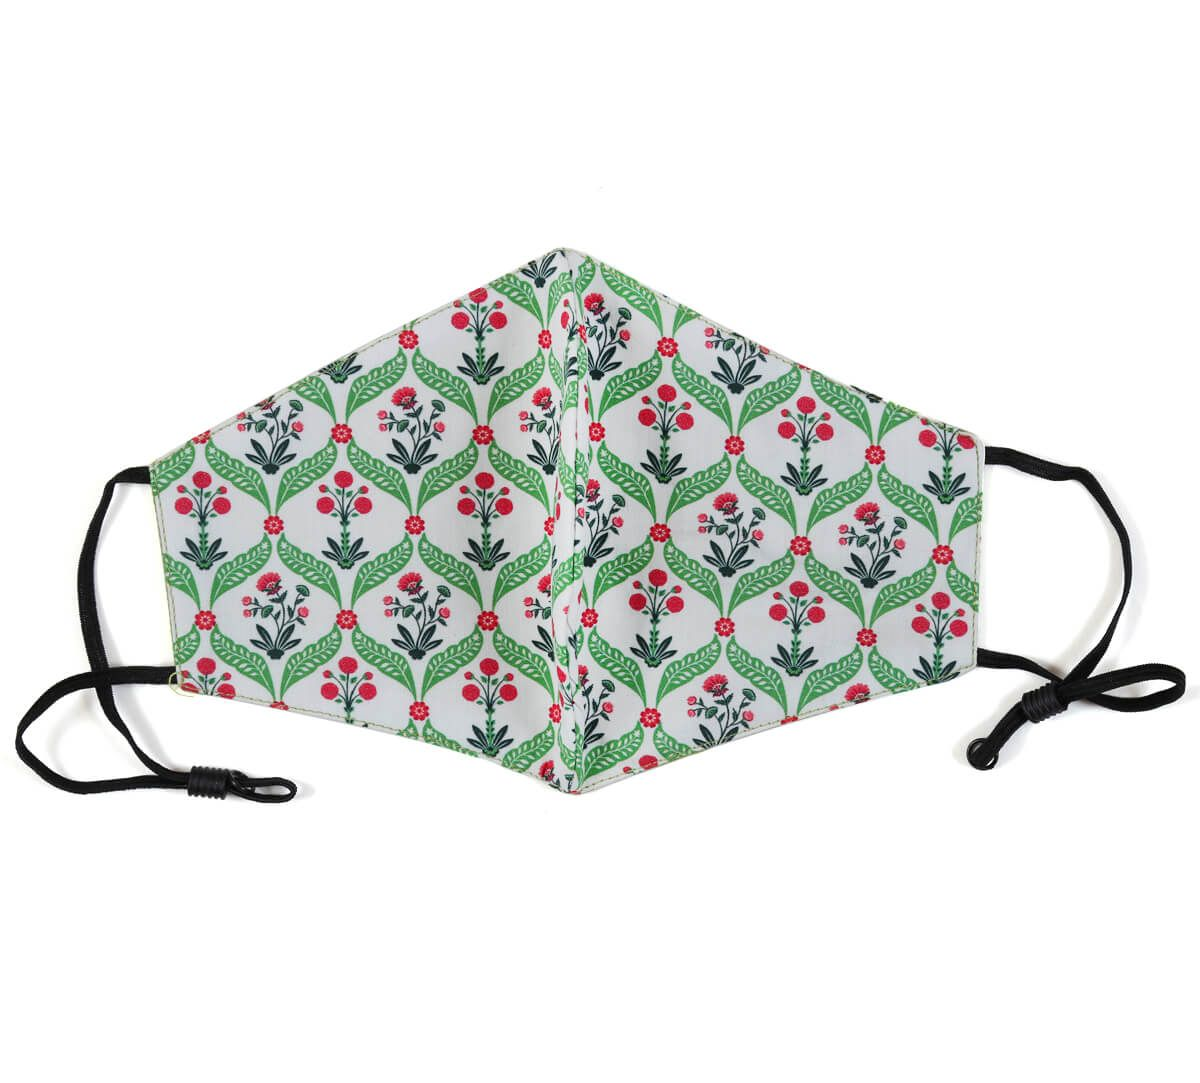 India Circus Blooming Dahlia Comfortable Outdoor Face Mask